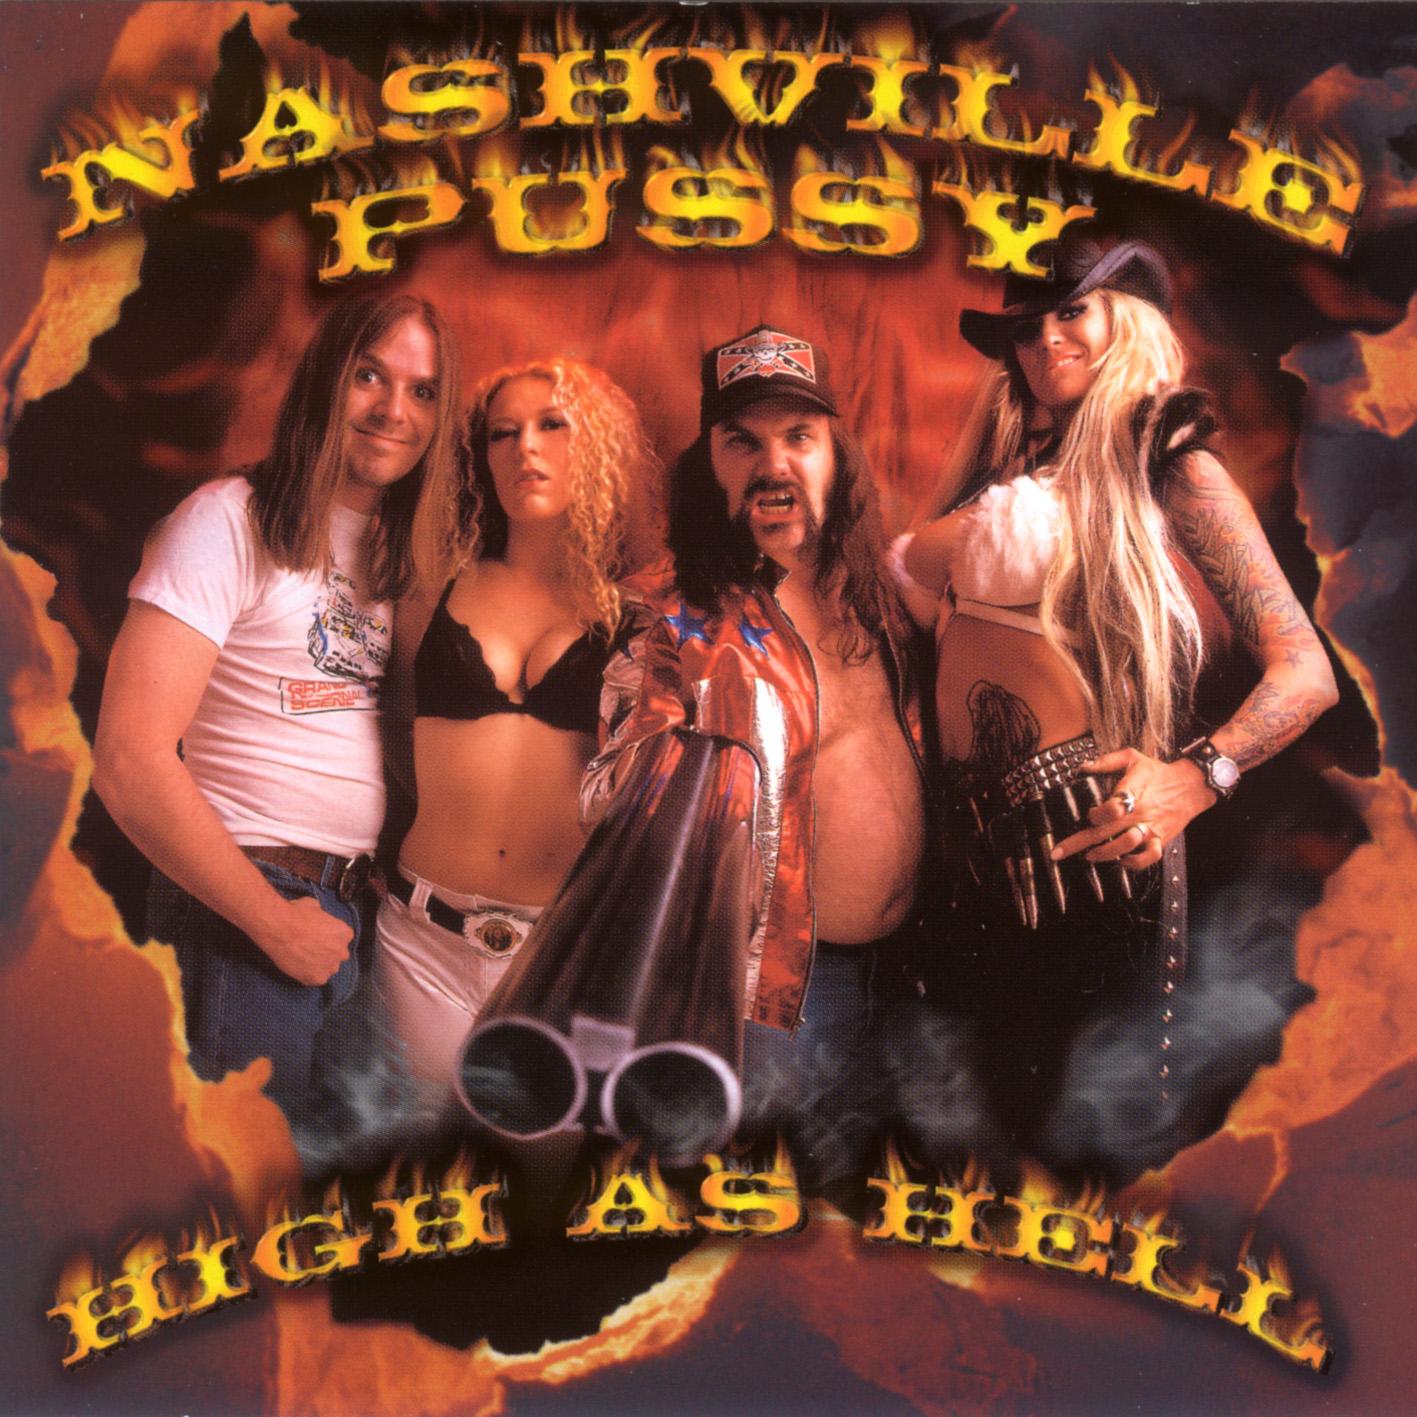 Nashville Pussy Blogspot 108